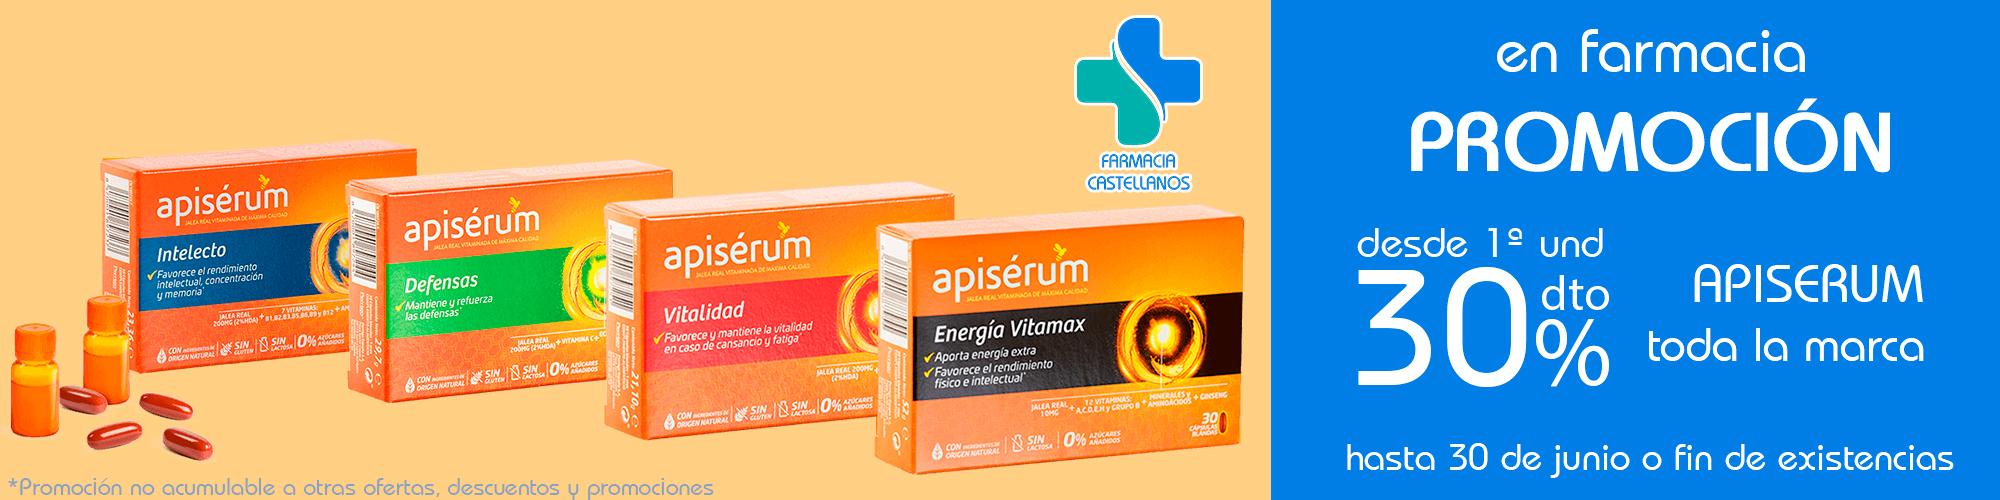 promocion-apiserum-farmaciabeatrizcastellanos